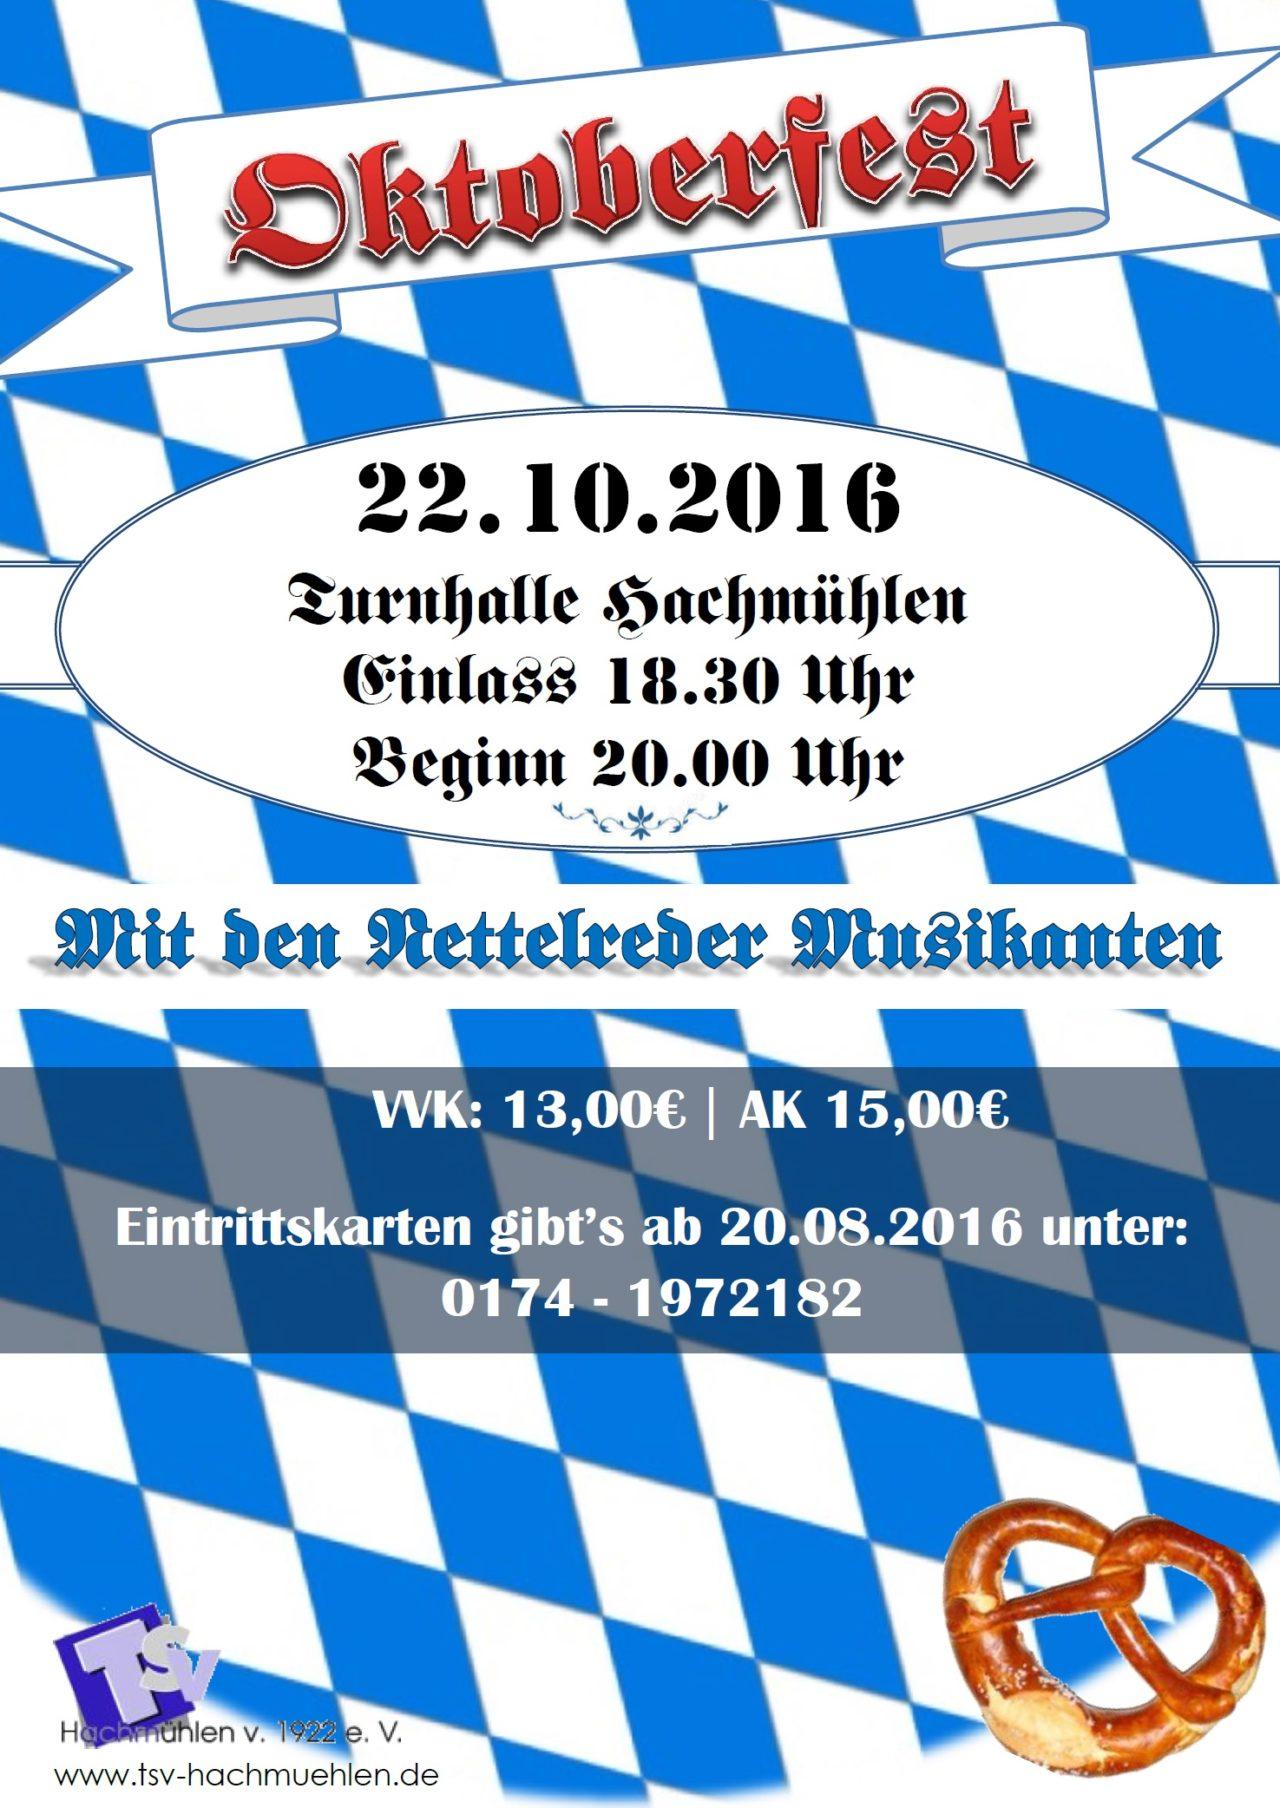 https://tsv-hachmuehlen.de/wp-content/uploads/2020/02/oktoberfest-2016-hachm-1280x1808.jpg